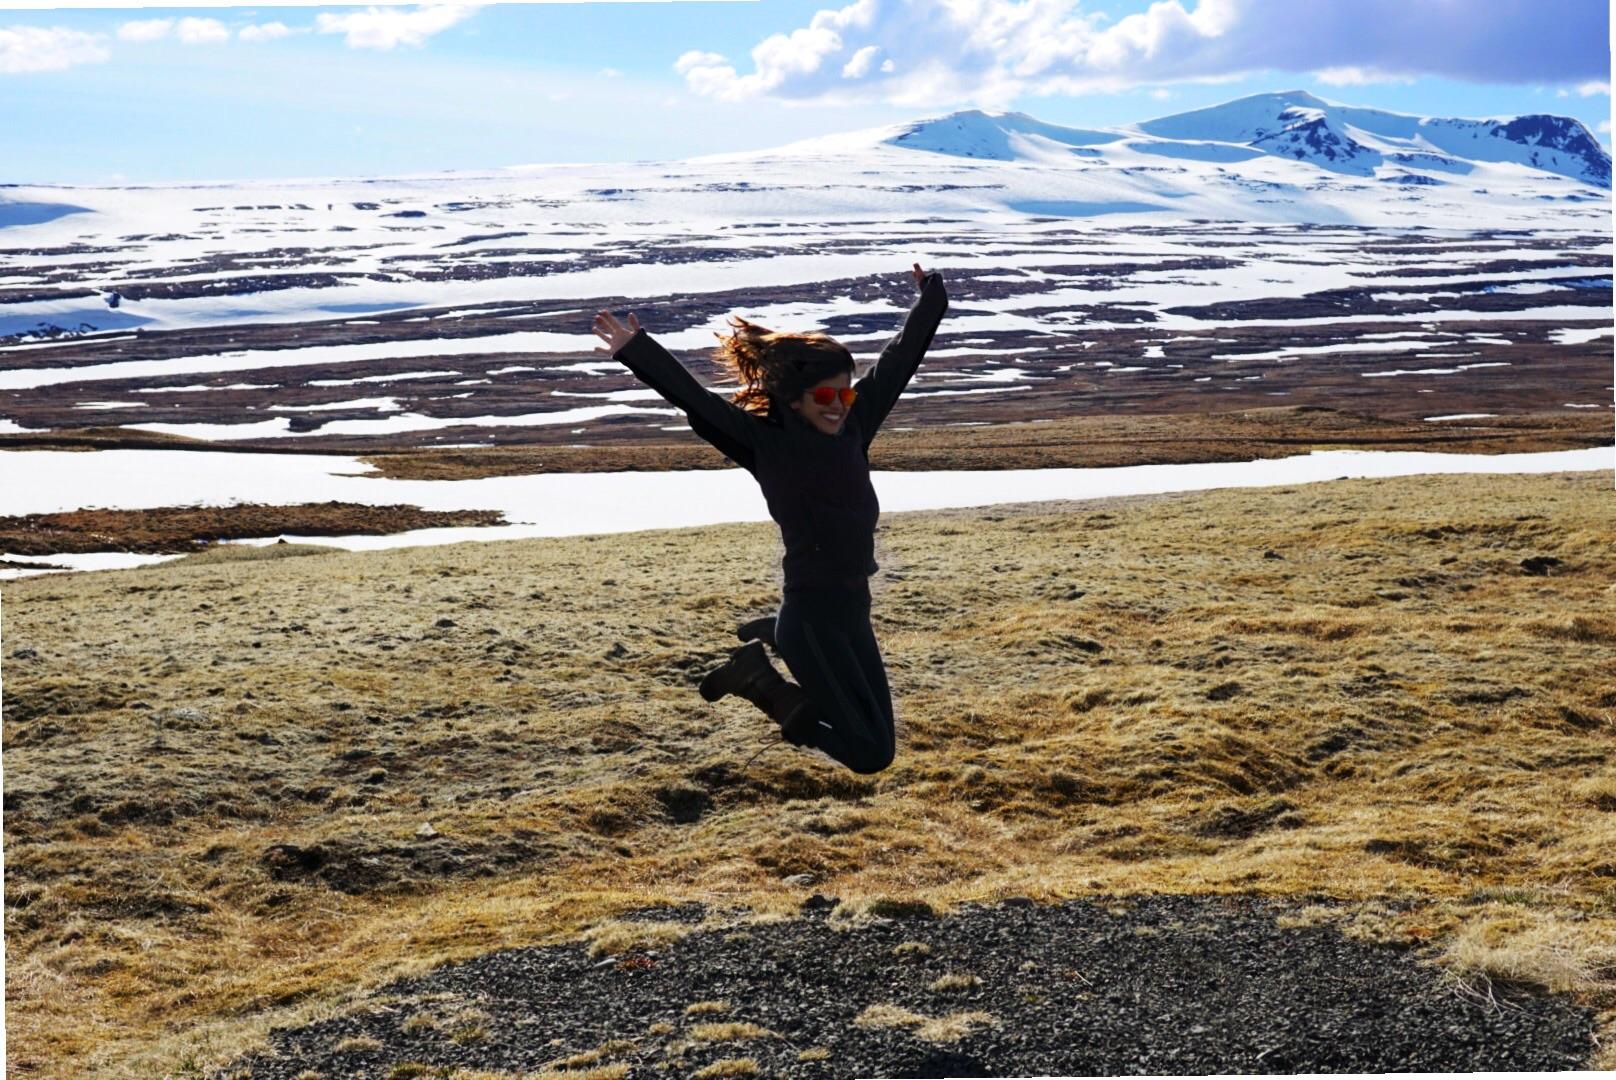 Wearing : - The North Face Palmeri Jacket, -Adirondack Tall Boots, -Polaroid Sunglasses -Pearl Izumi wind block pants.  I'm telling you - buy cool sunglasses. It's worth it. I'm jumping for joy because I'm so warm.